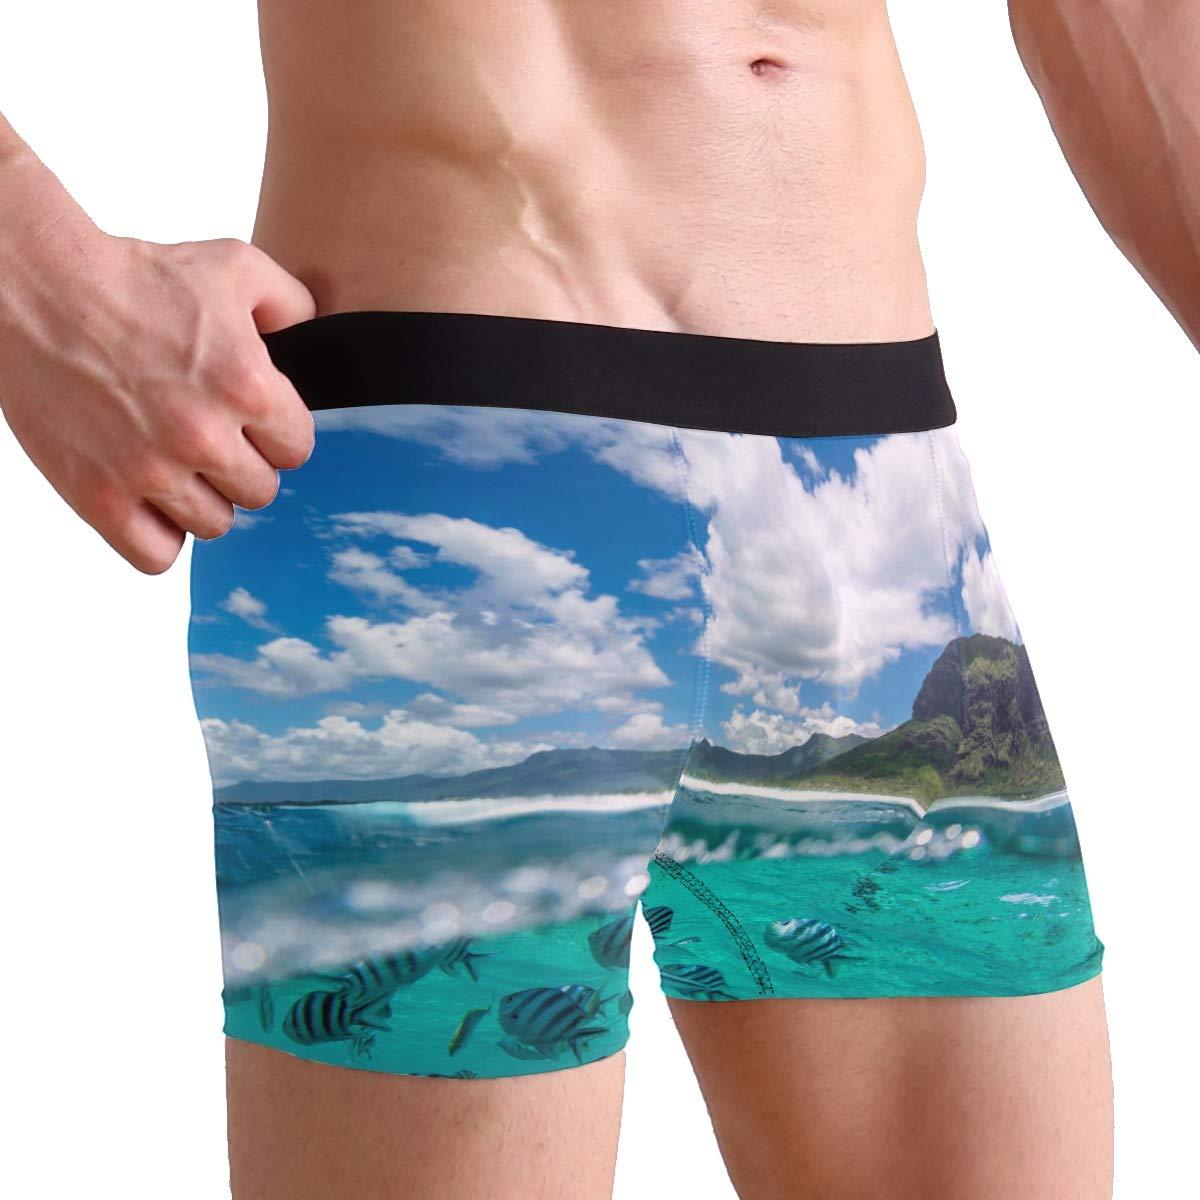 MOFEIYUE Mens Boxer Briefs Tropical Fish Ocean Animal Soft Short Underpants Underwear for Men Boys